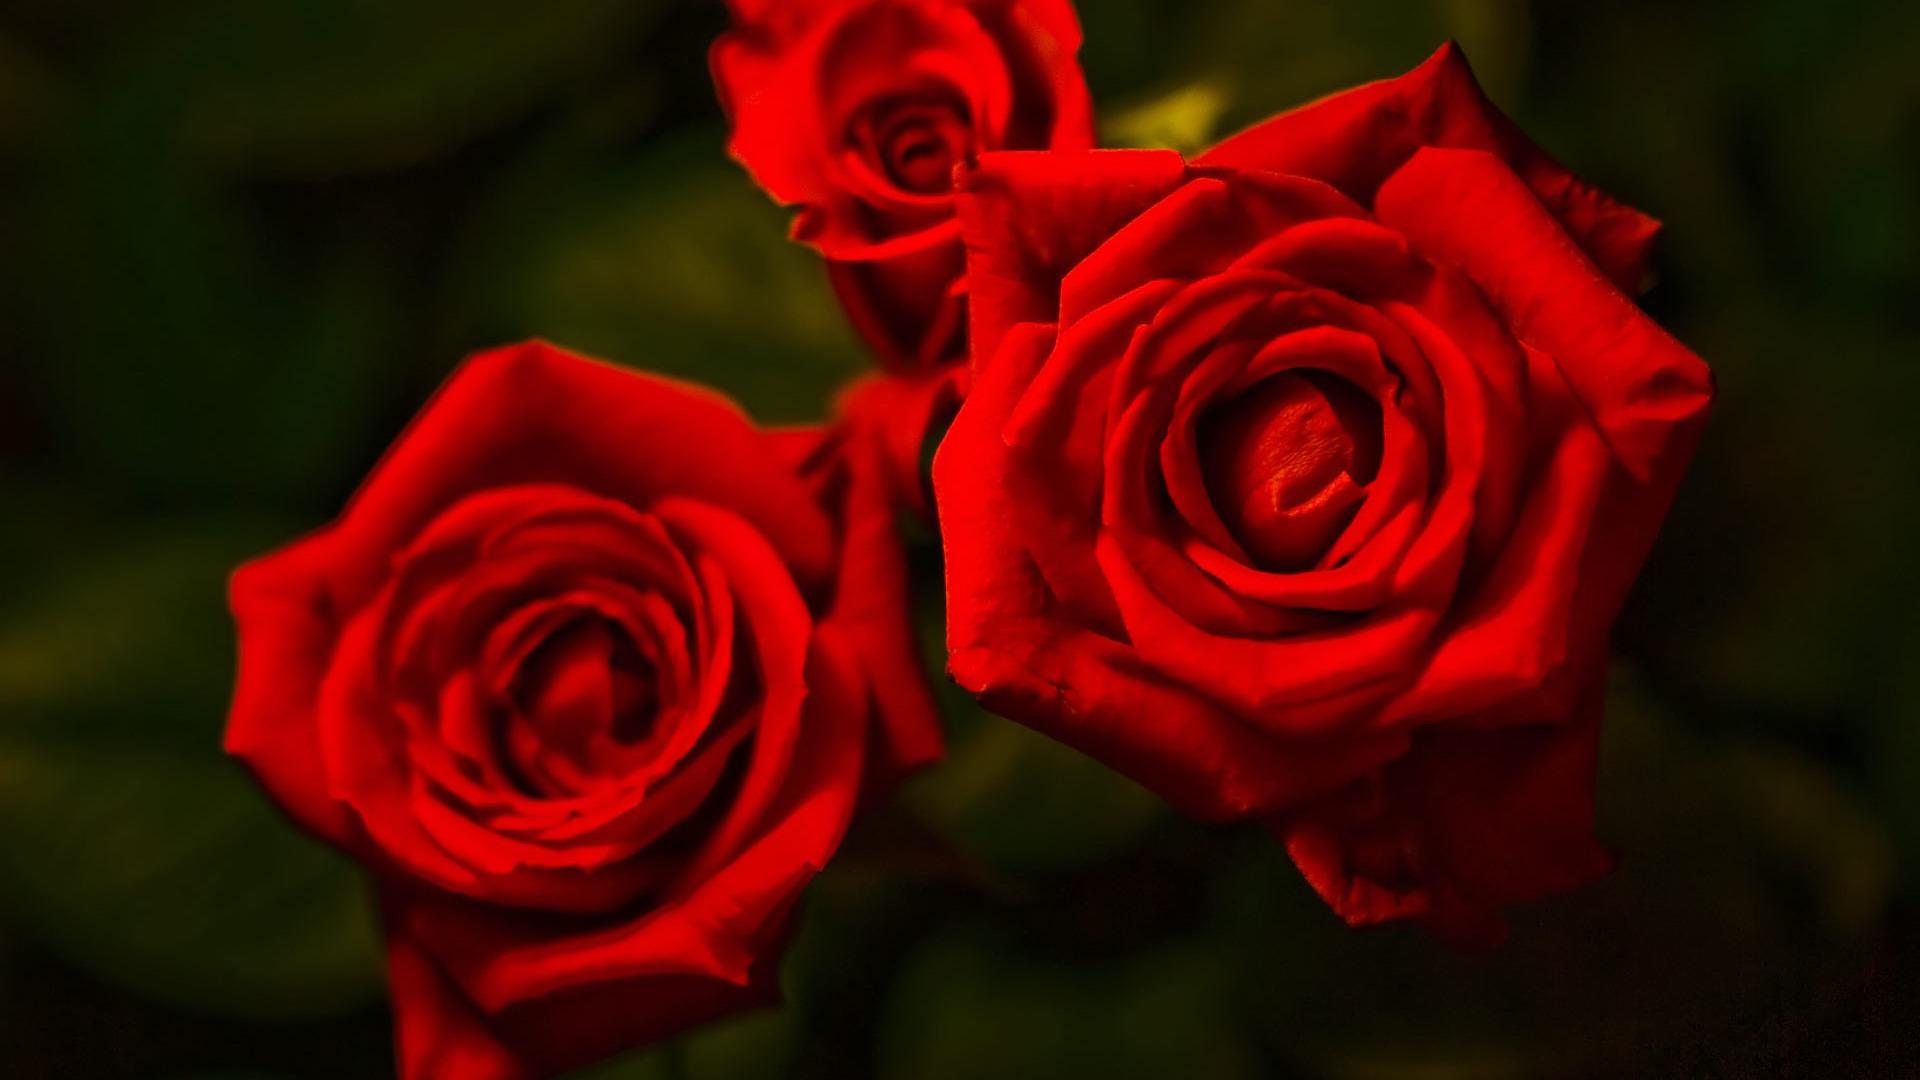 Red roses wallpaper 889 1920x1080